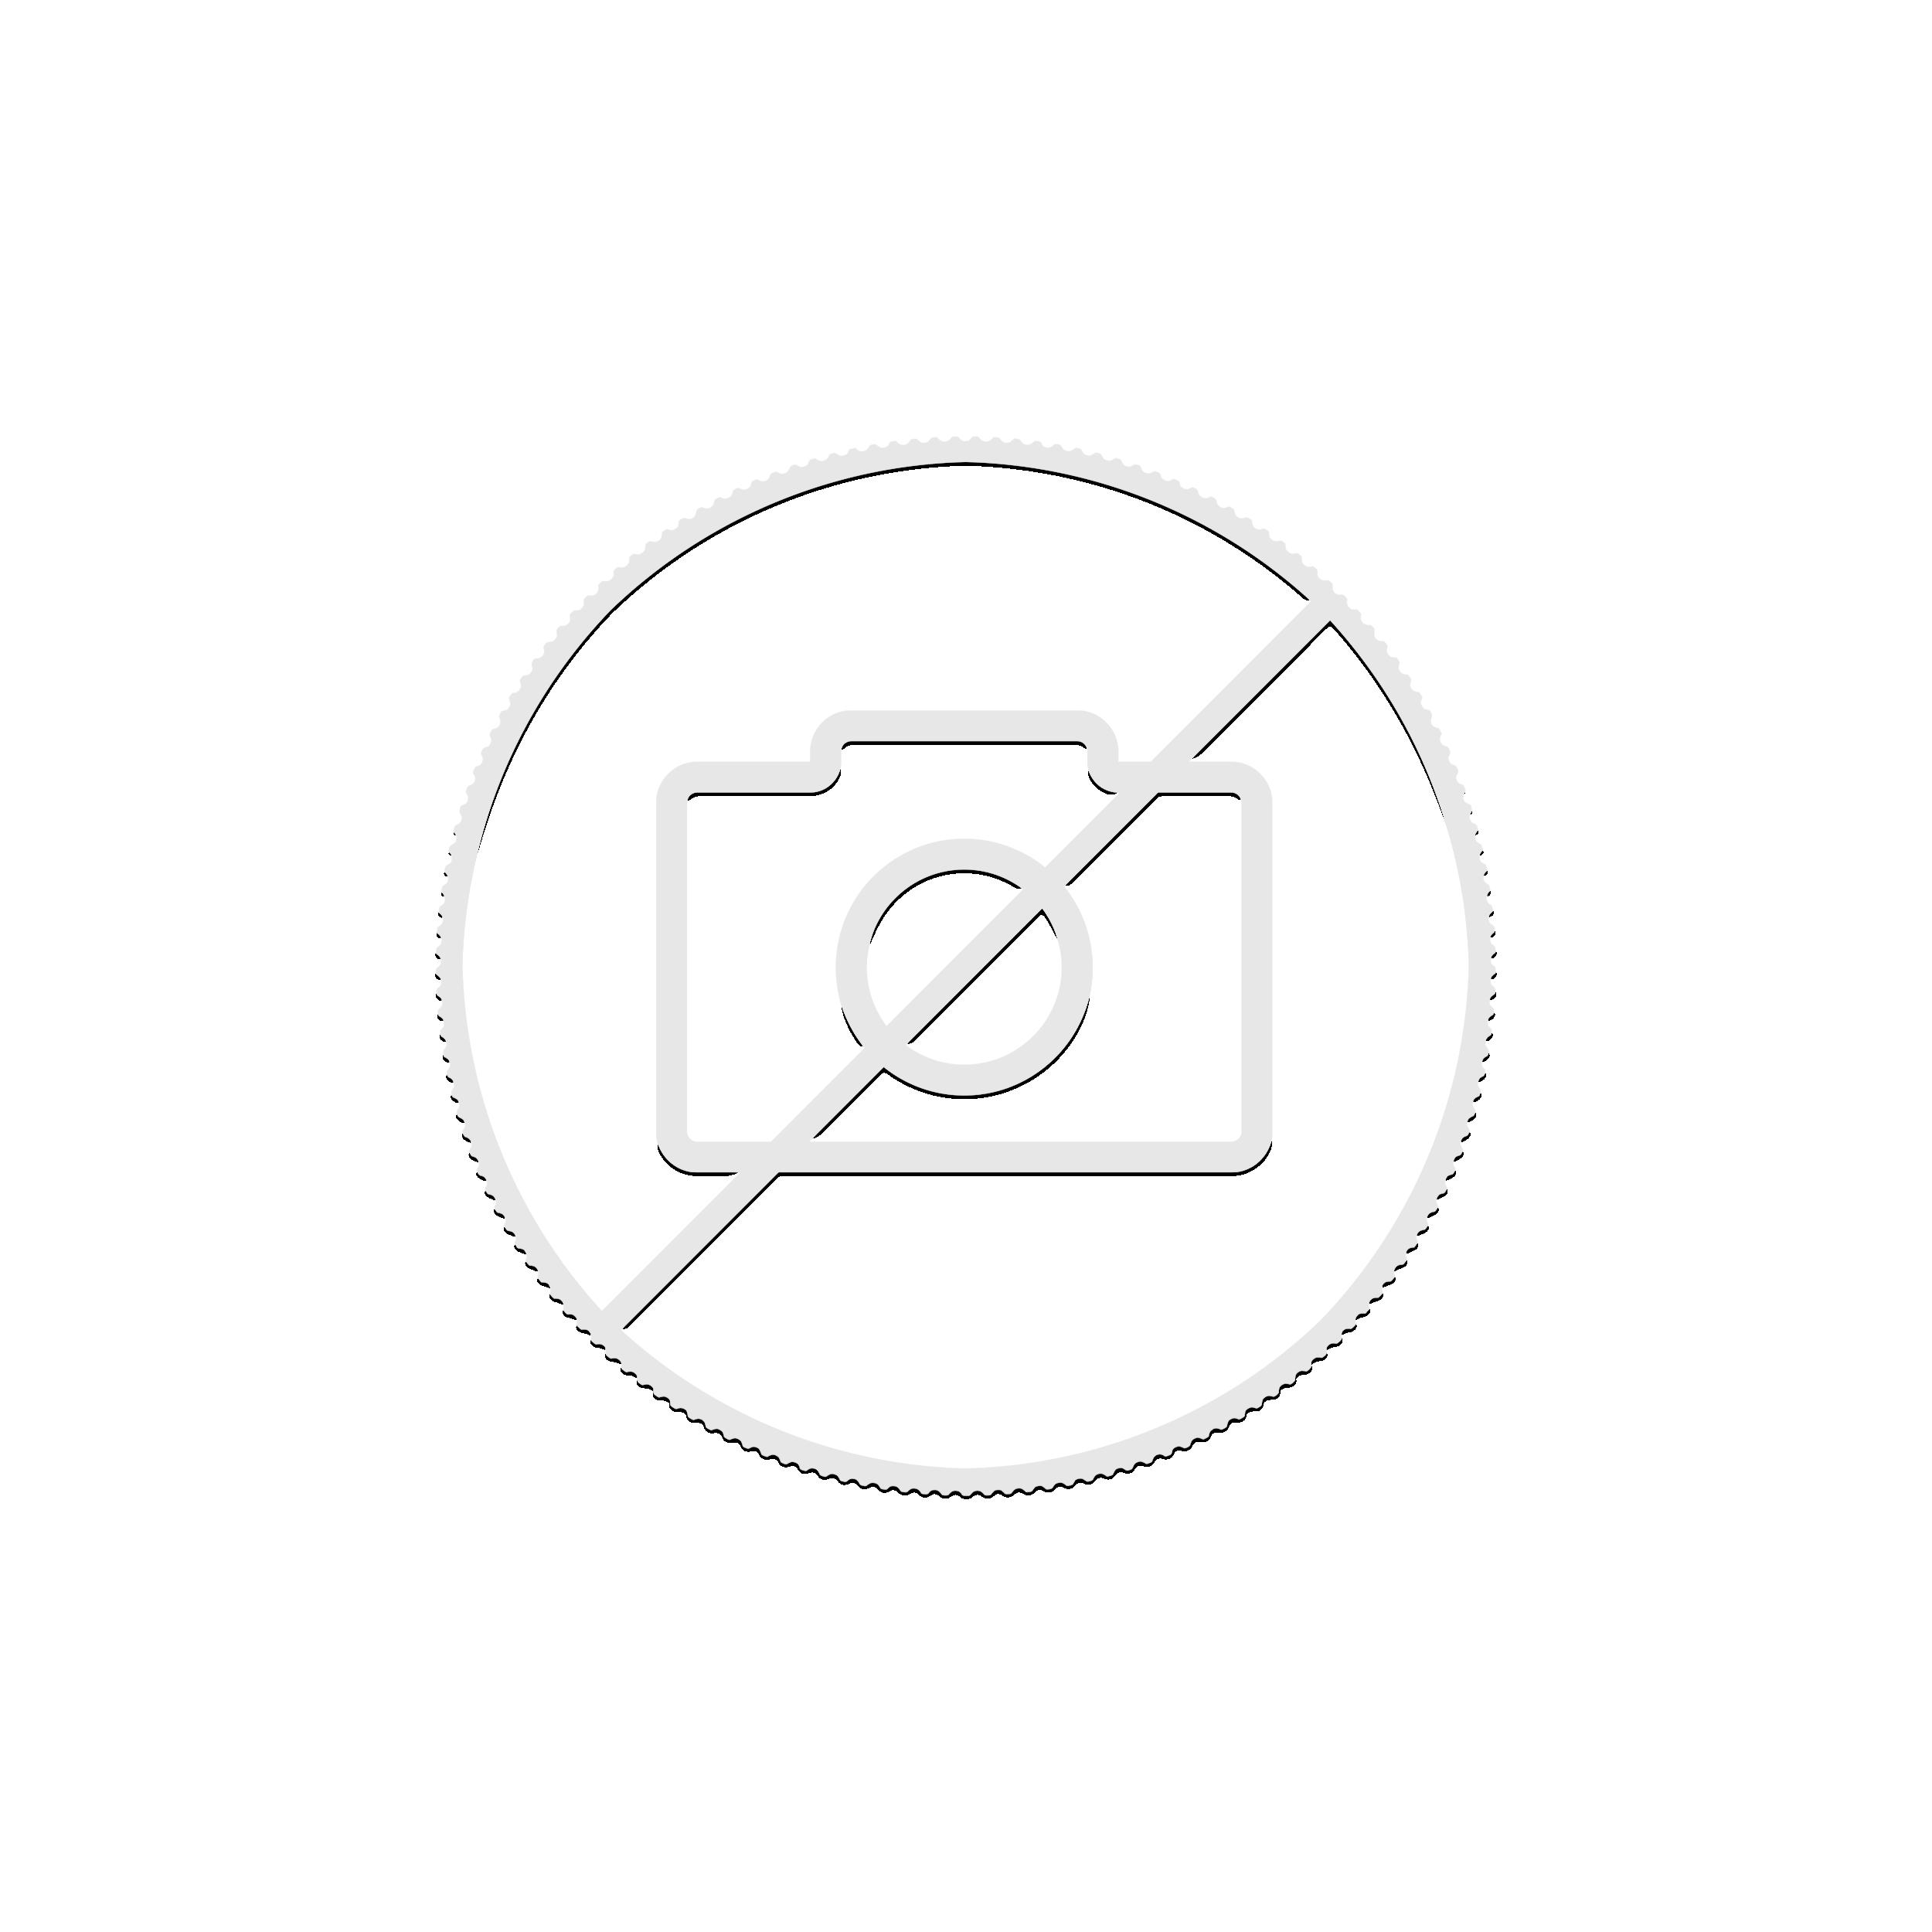 1/4 Troy ounce gold coin Queens Beasts Yale of Beaufort 2019 Queen Elizabeth II